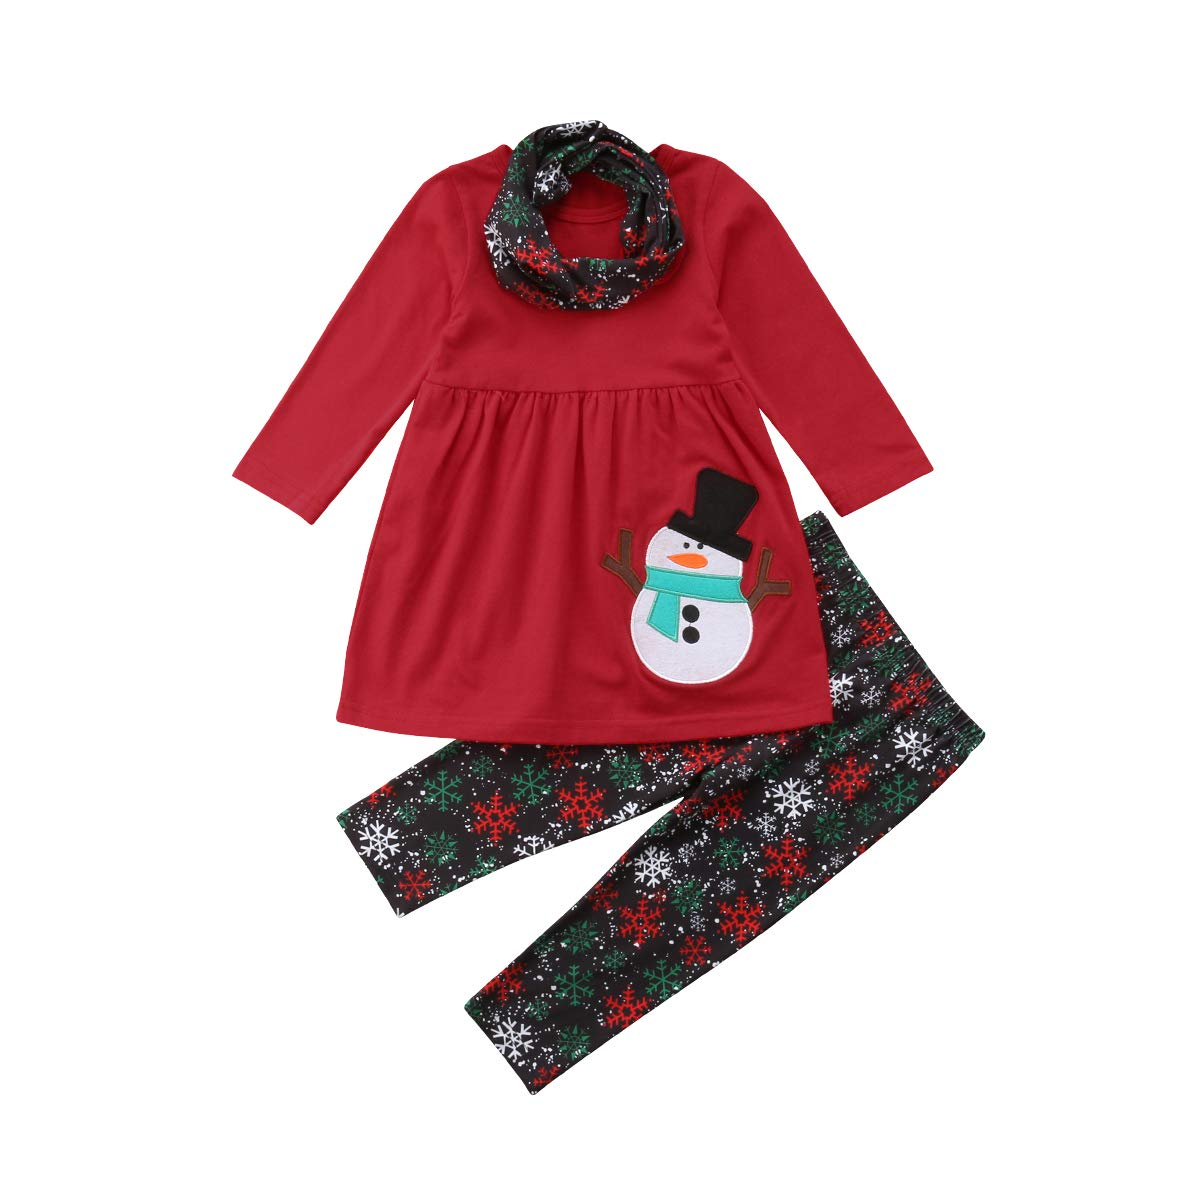 Seyurigaoka Christmas Outfit Toddler Baby Girl Long Sleeve Snowman T-Shirt Dress Snowflakes Pants